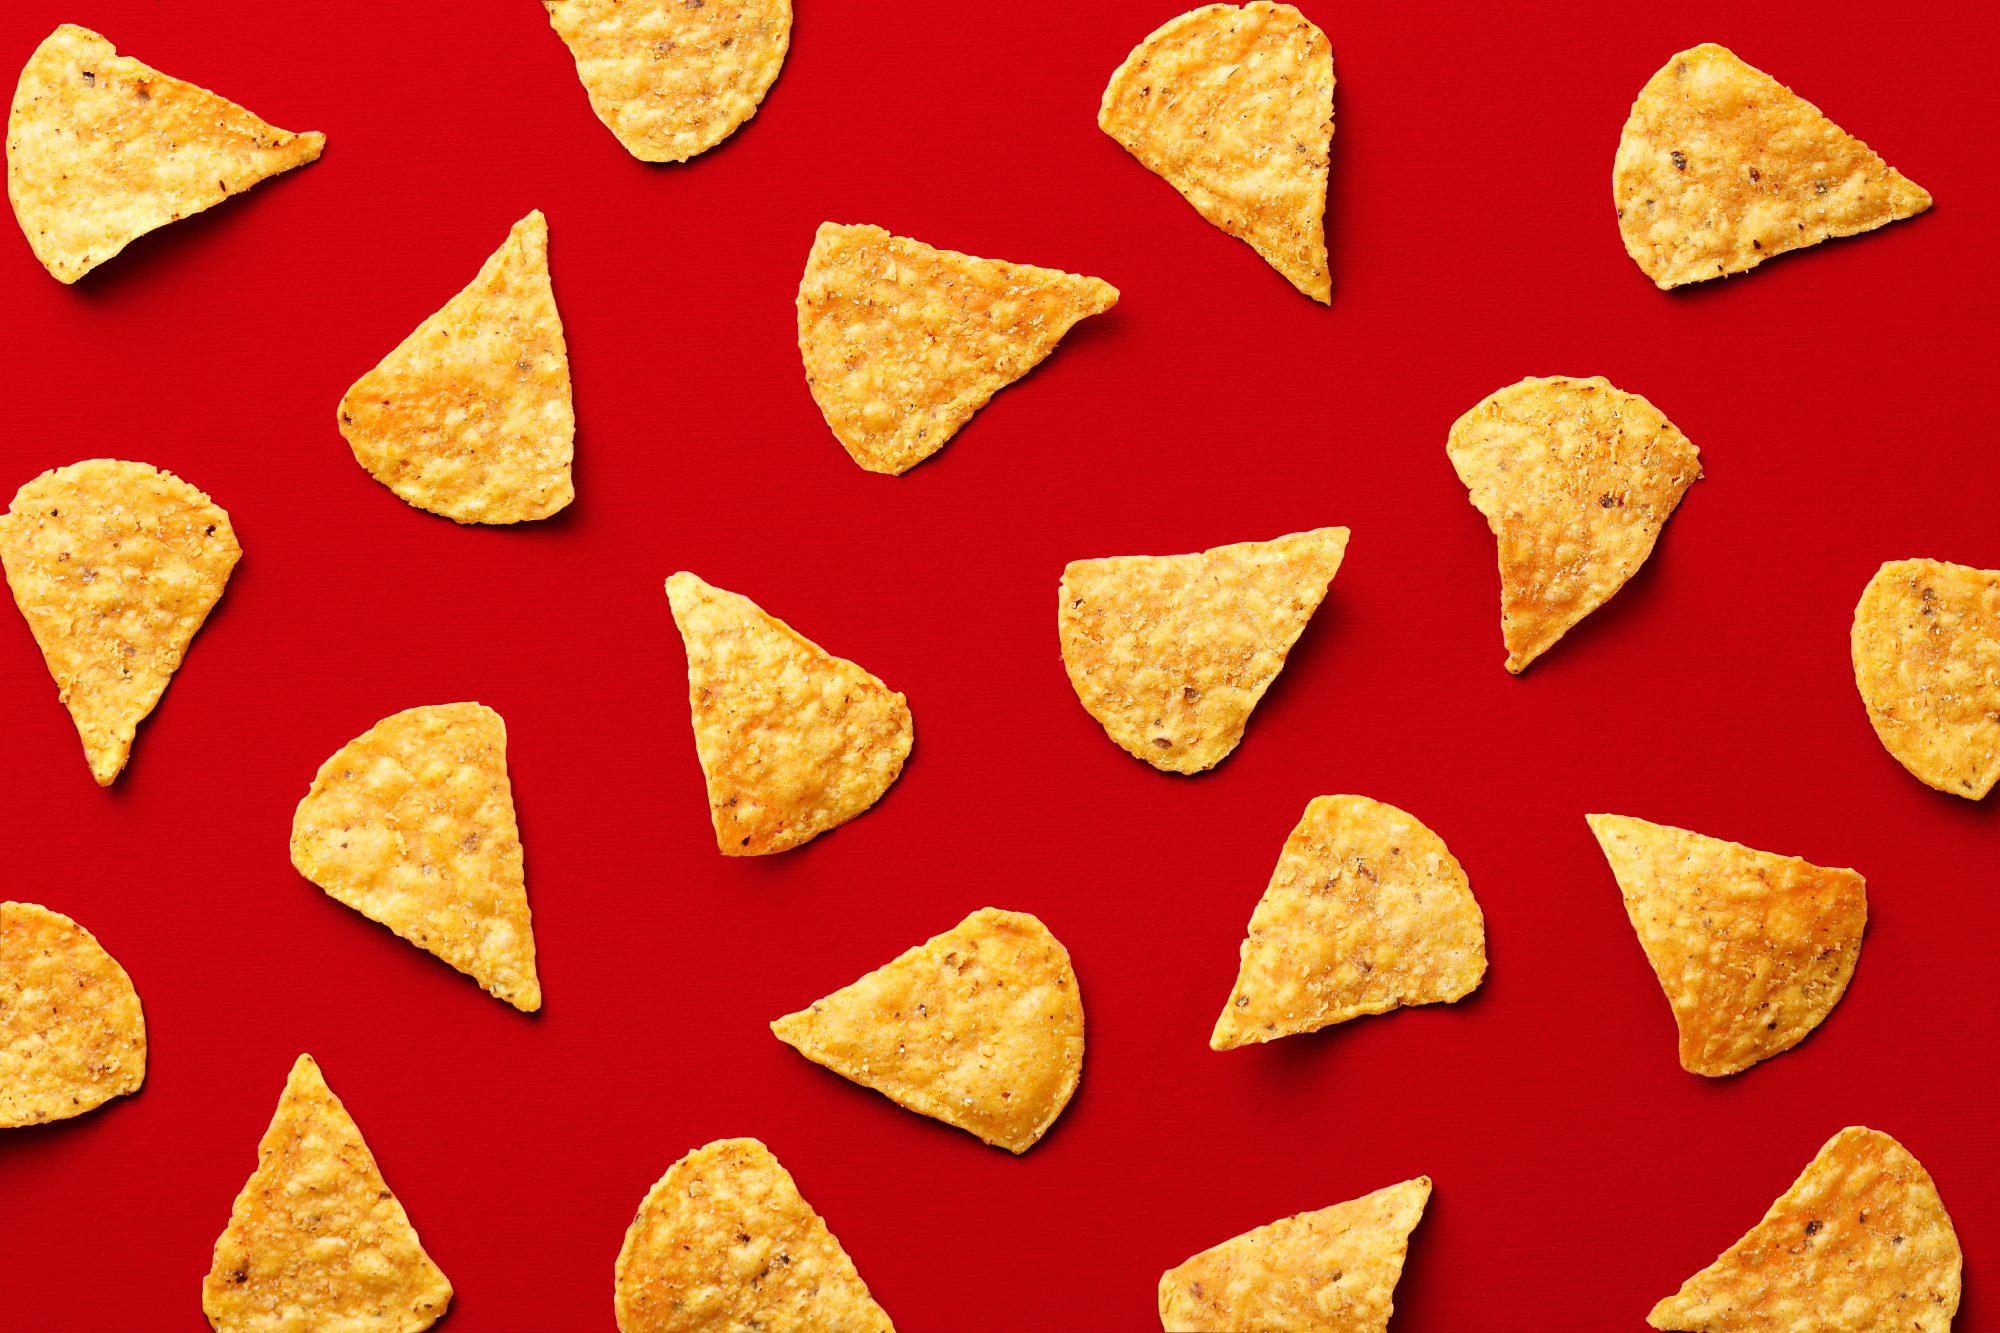 Tortilla Chips Getty 2/7/20